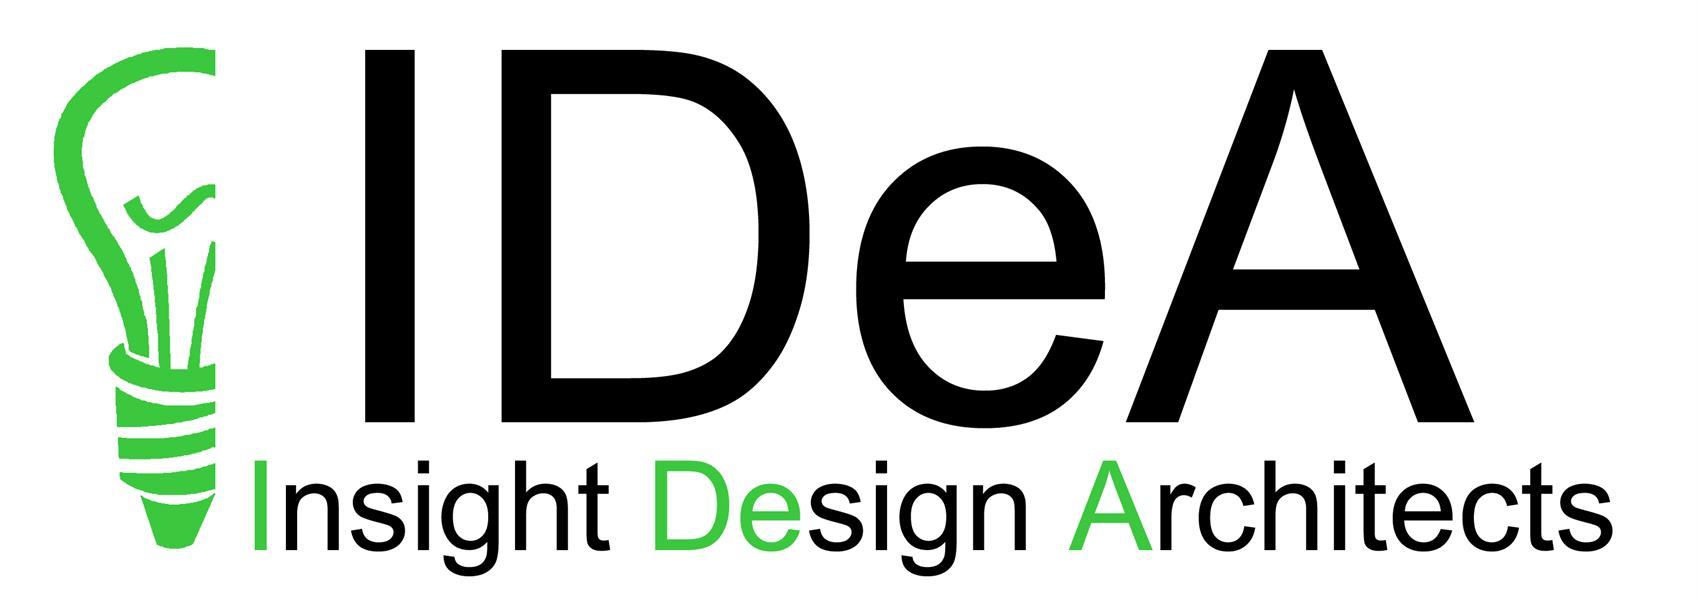 IDeA - Insight Design Architects. LLC